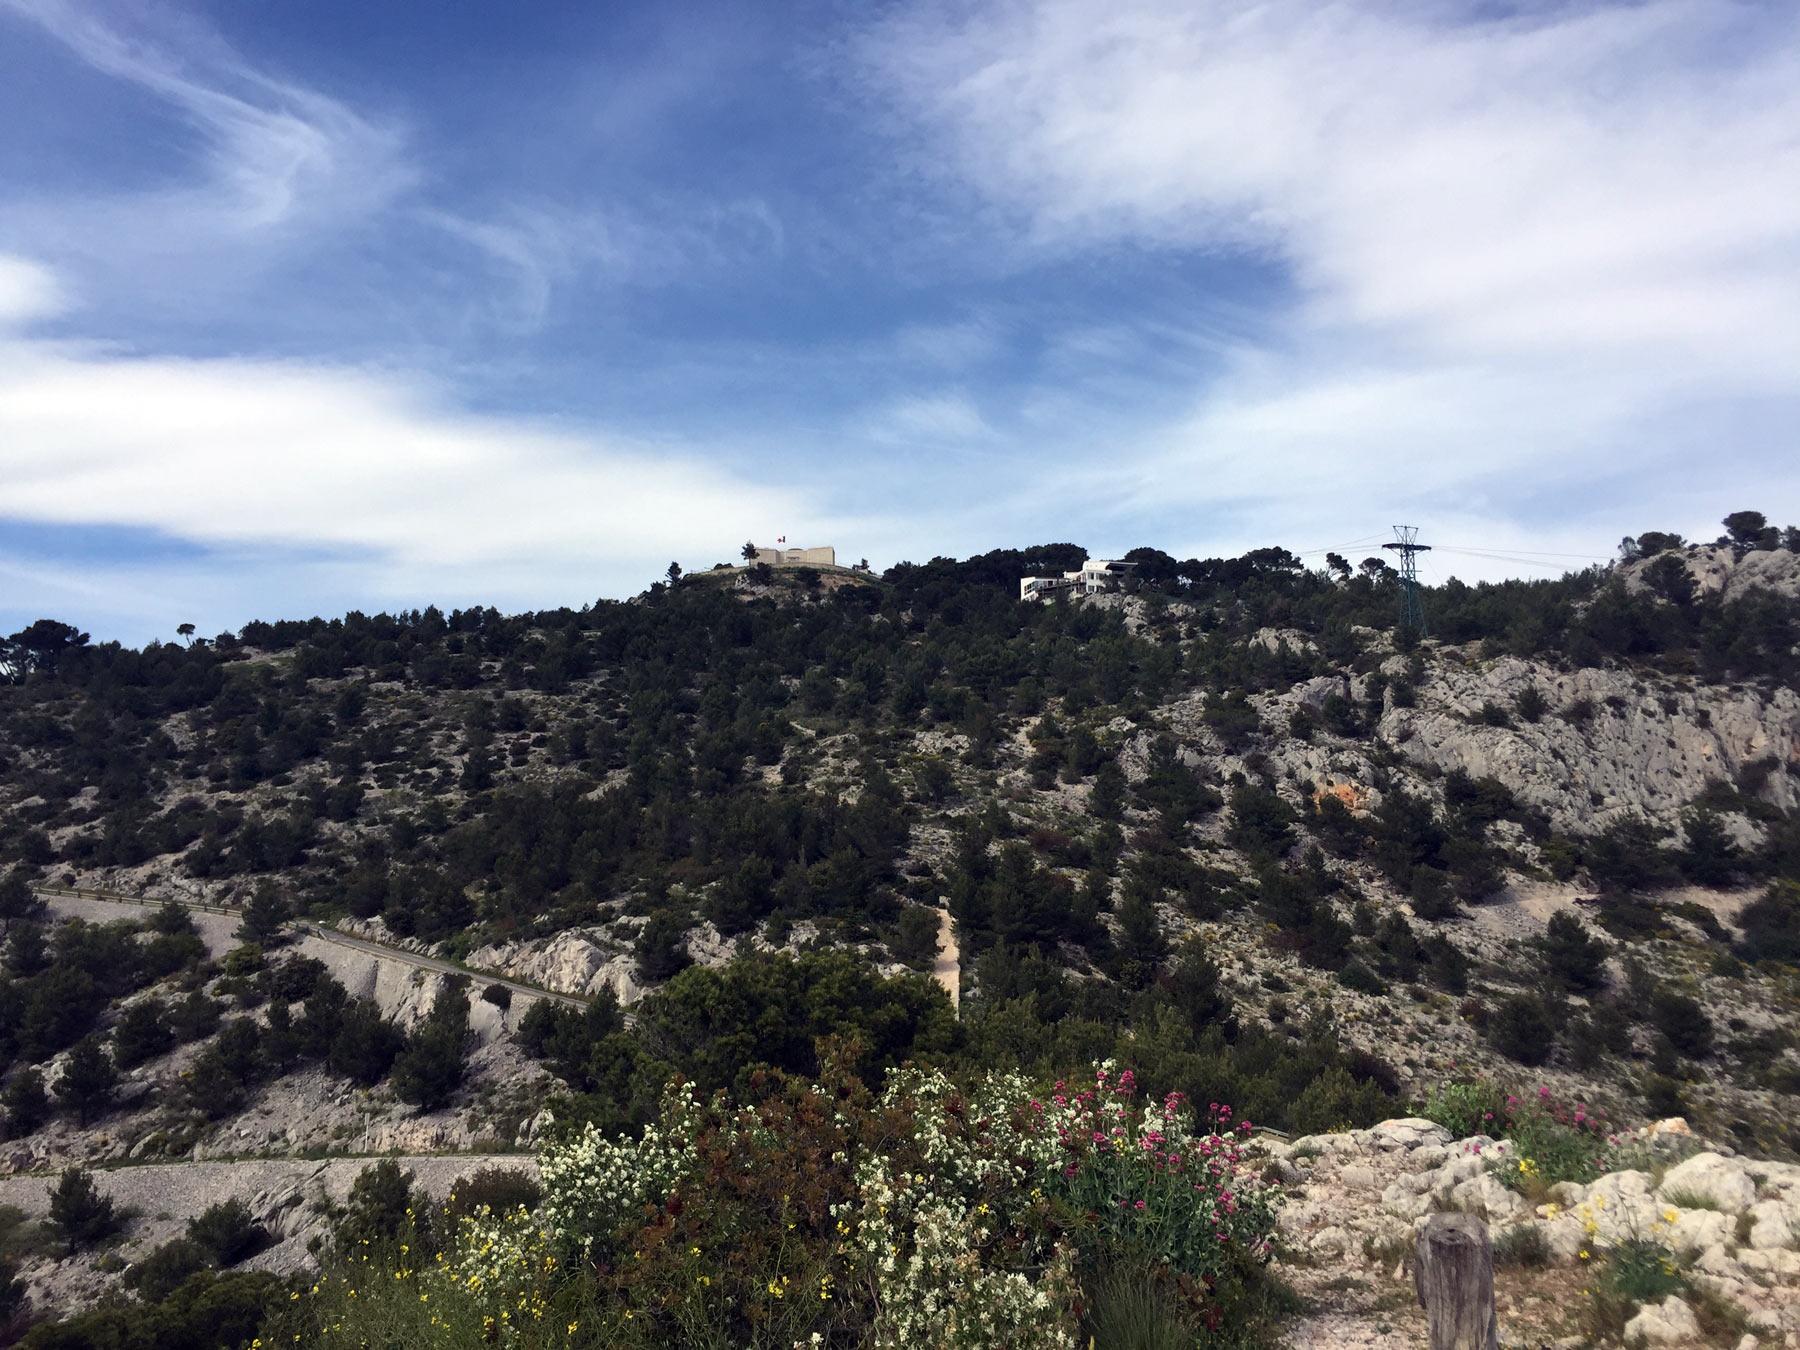 экскурсия на гору Тулон